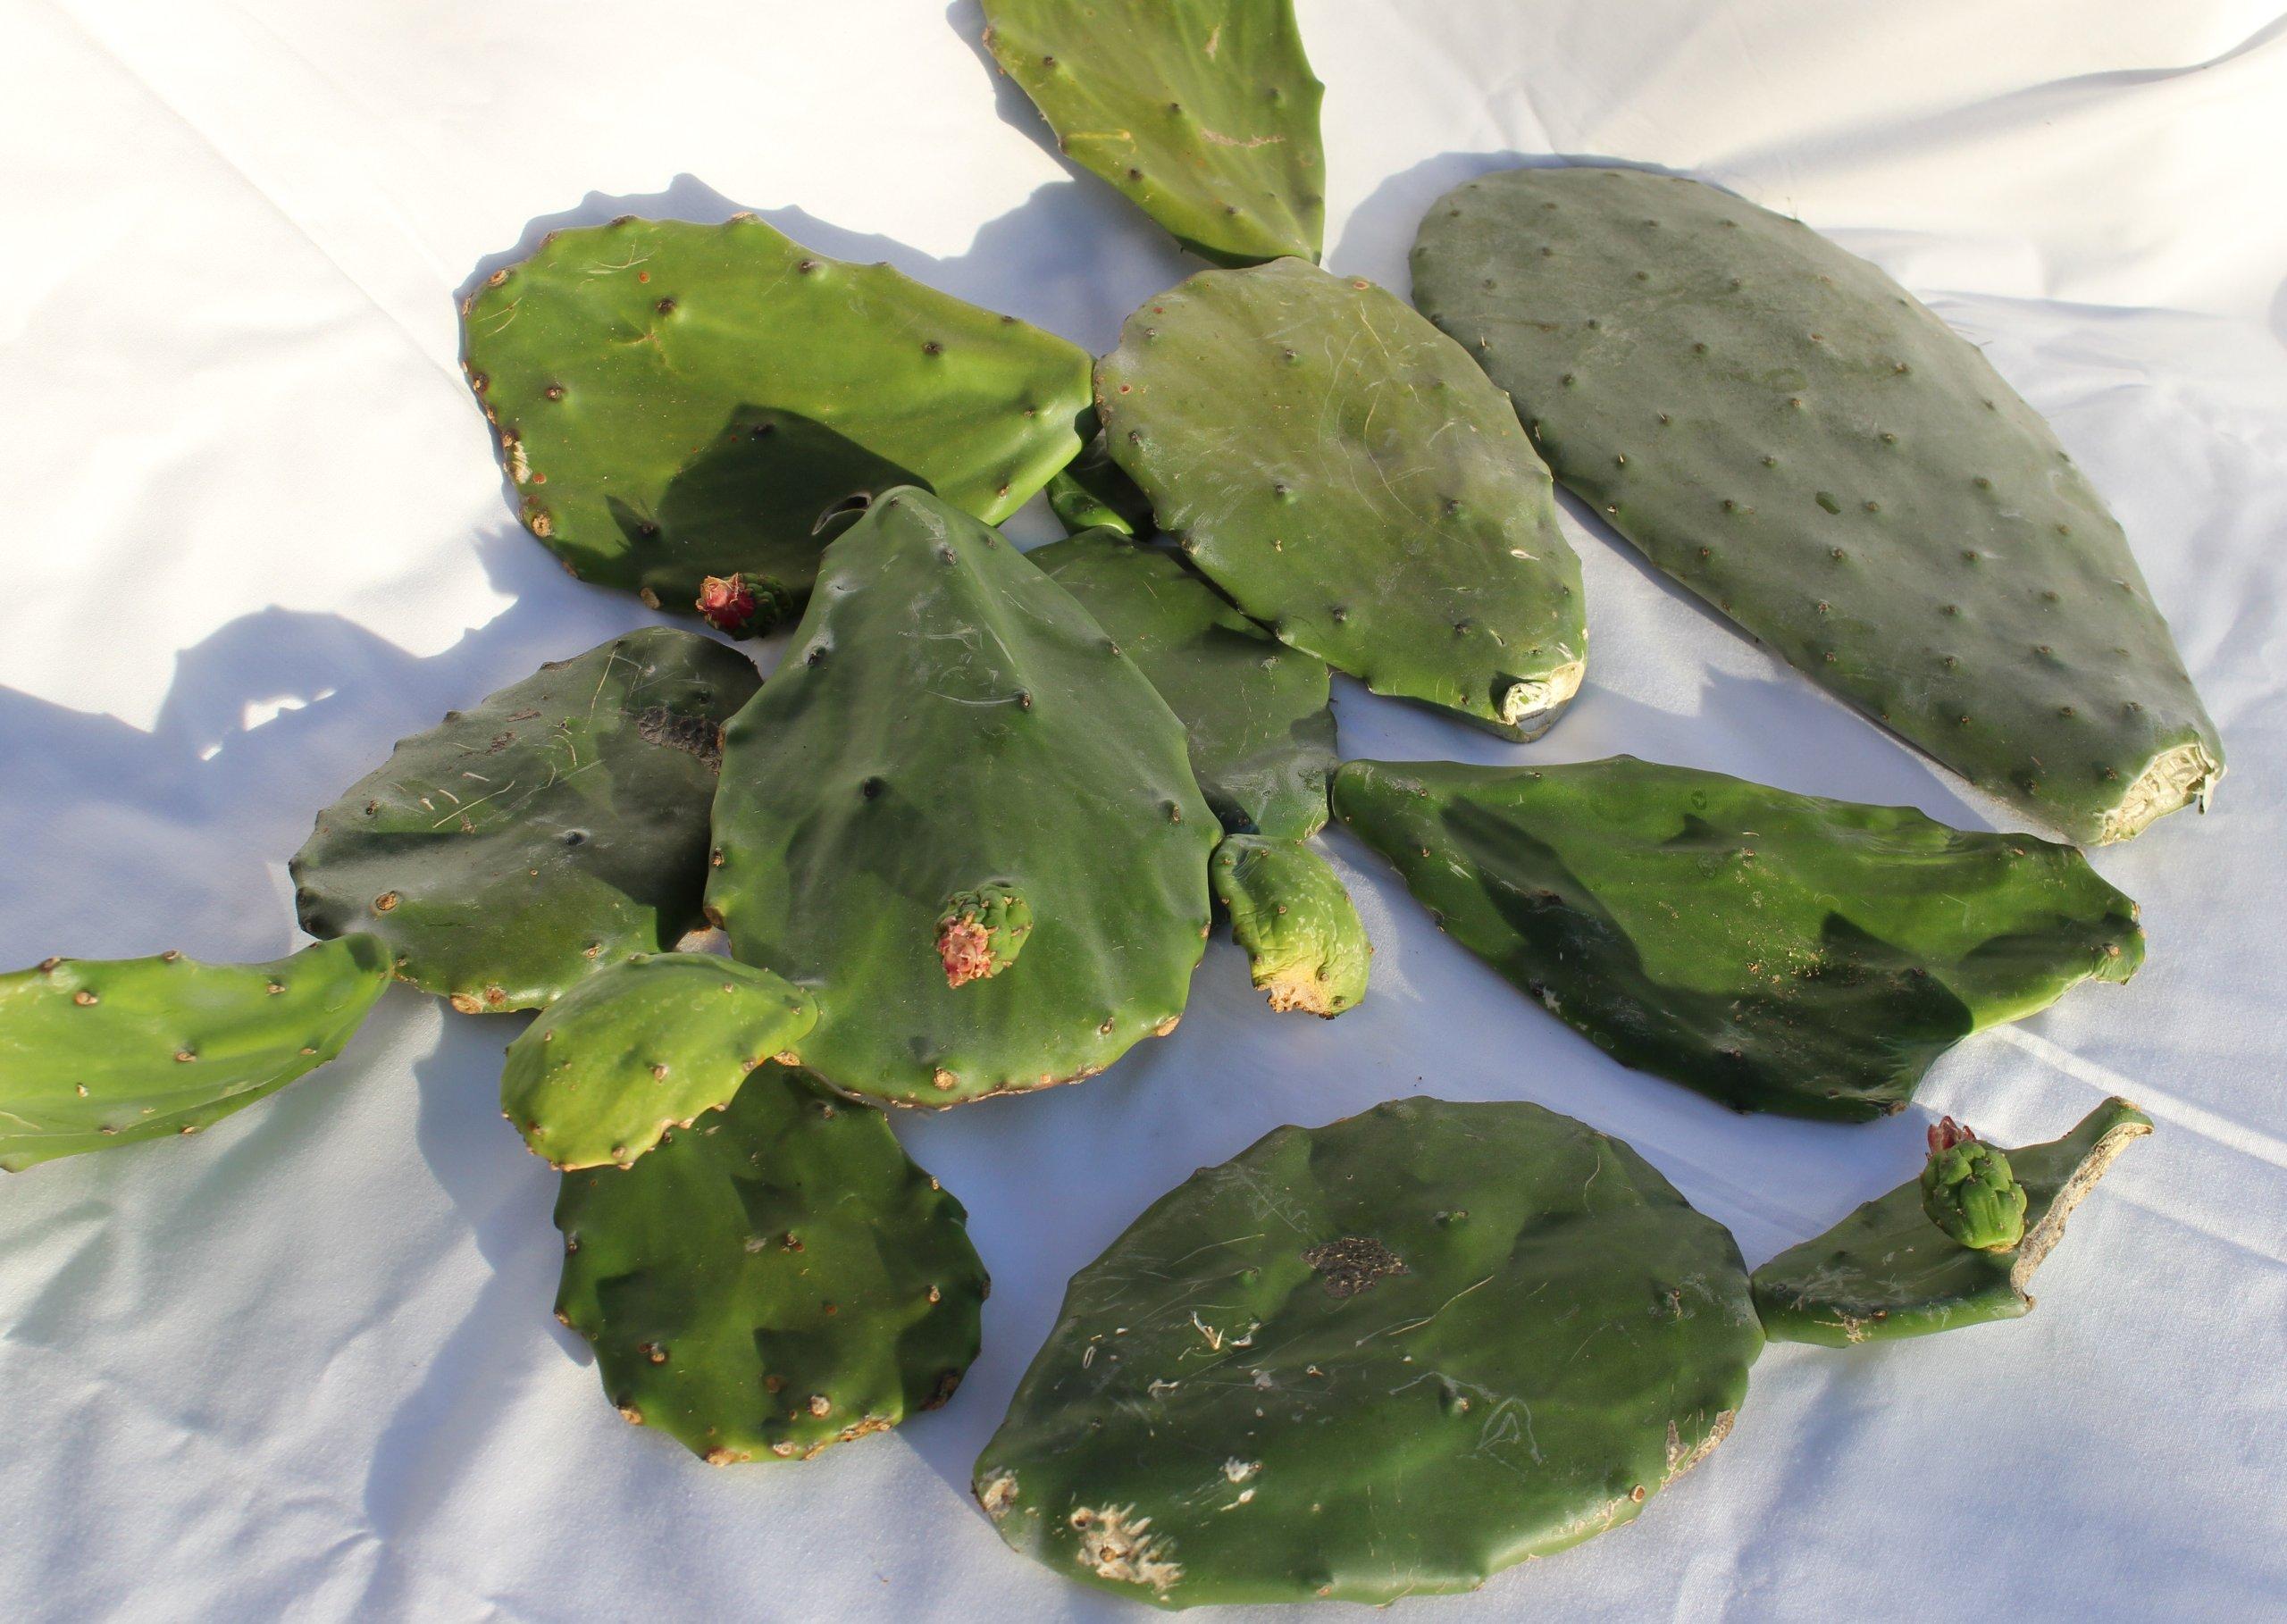 Jiimz Nopales Opuntia Cactus succulent Cuttings 6 pounds reptile food